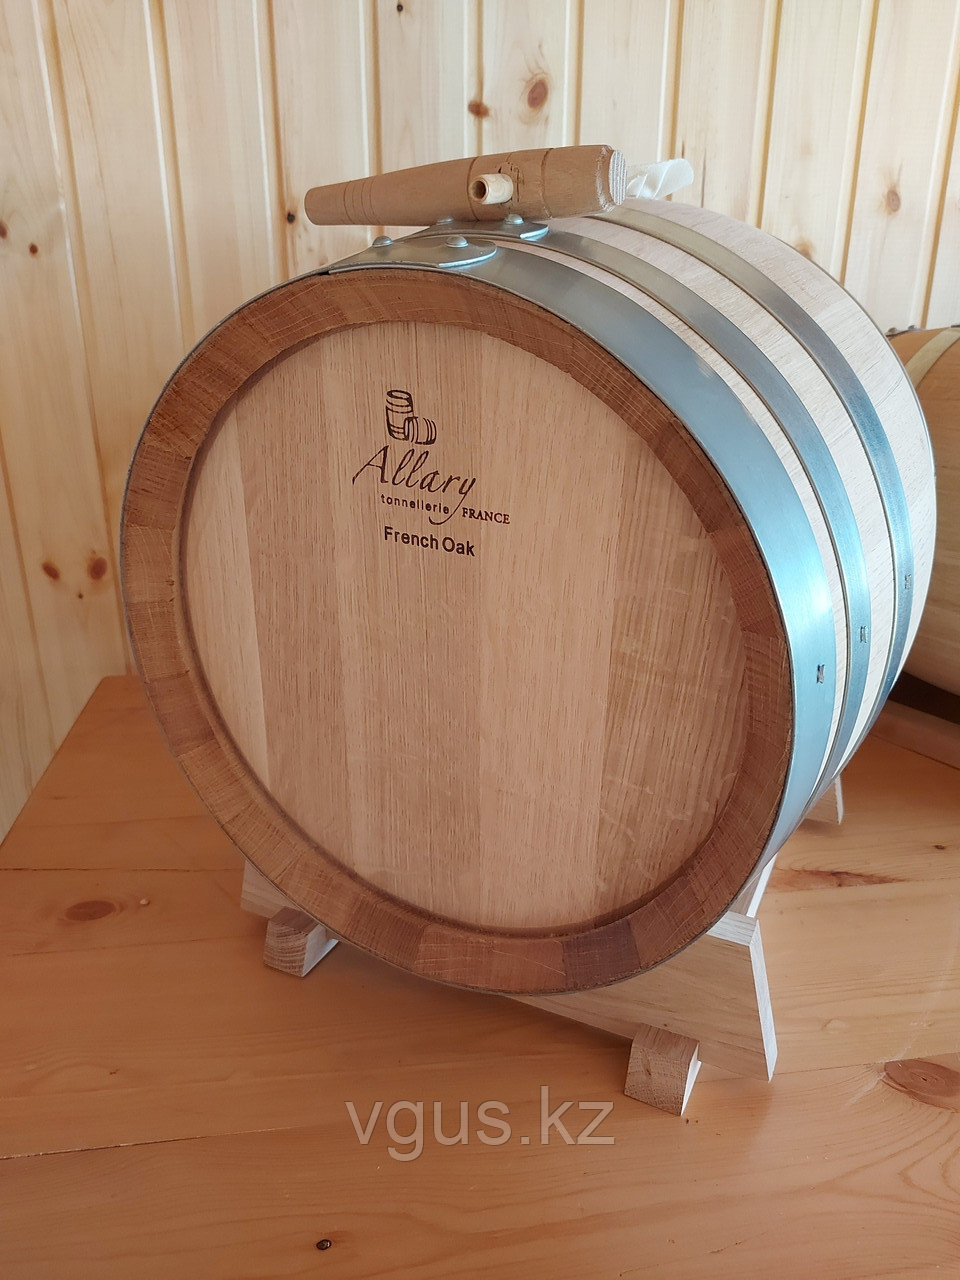 Бочка Allary 15 литров